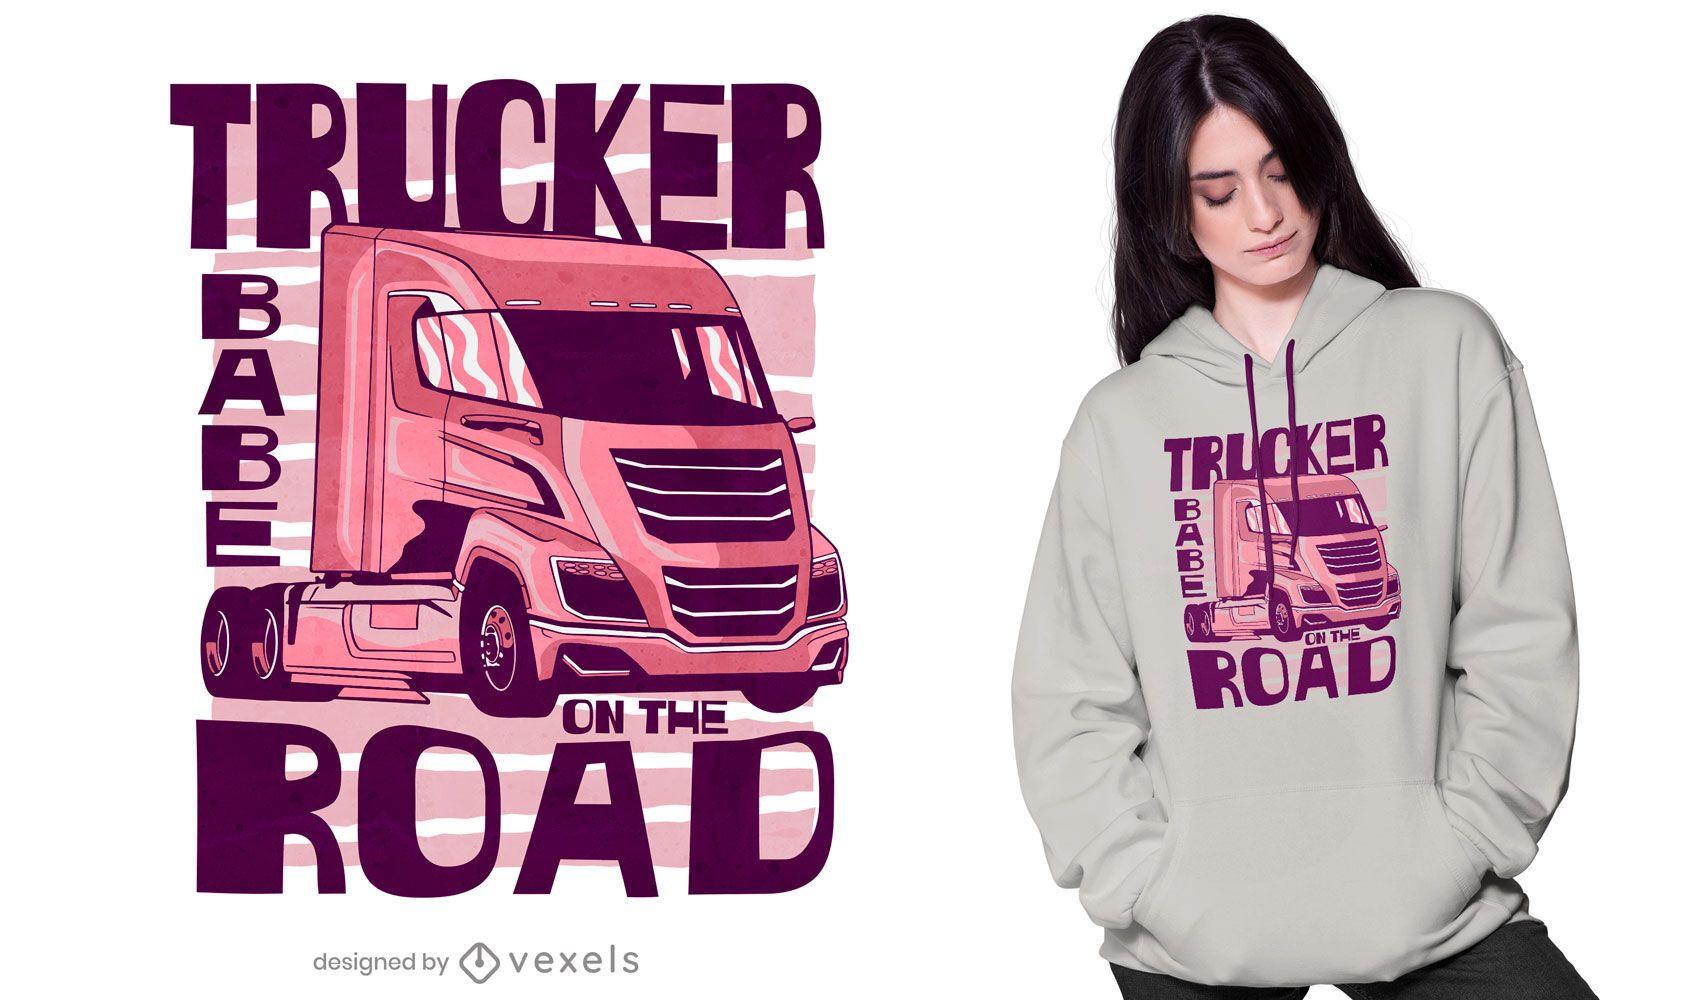 Trucker babe road t-shirt design